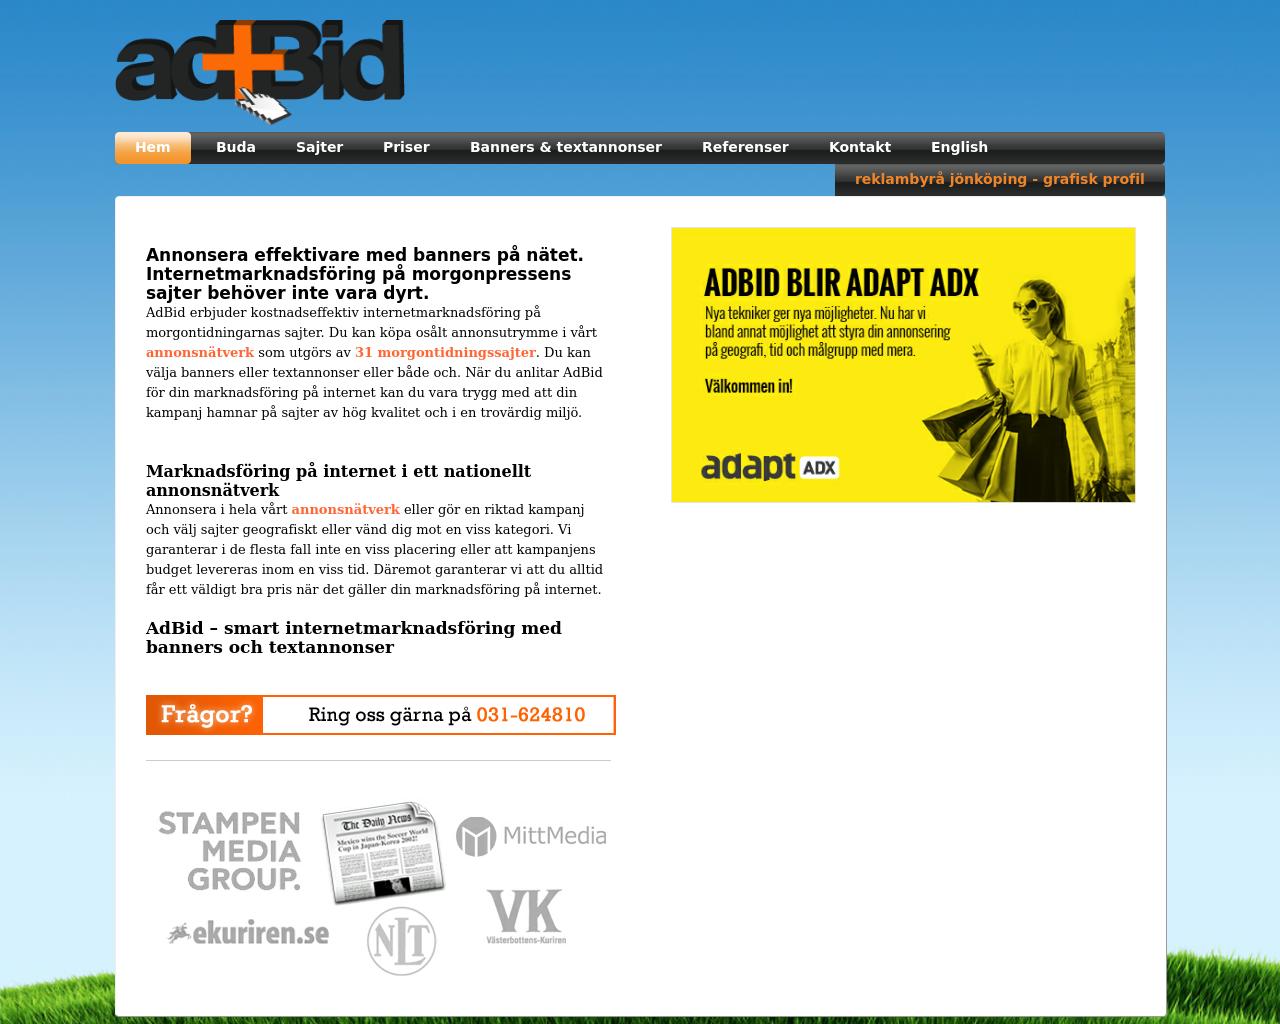 AdBid-Advertising-Reviews-Pricing